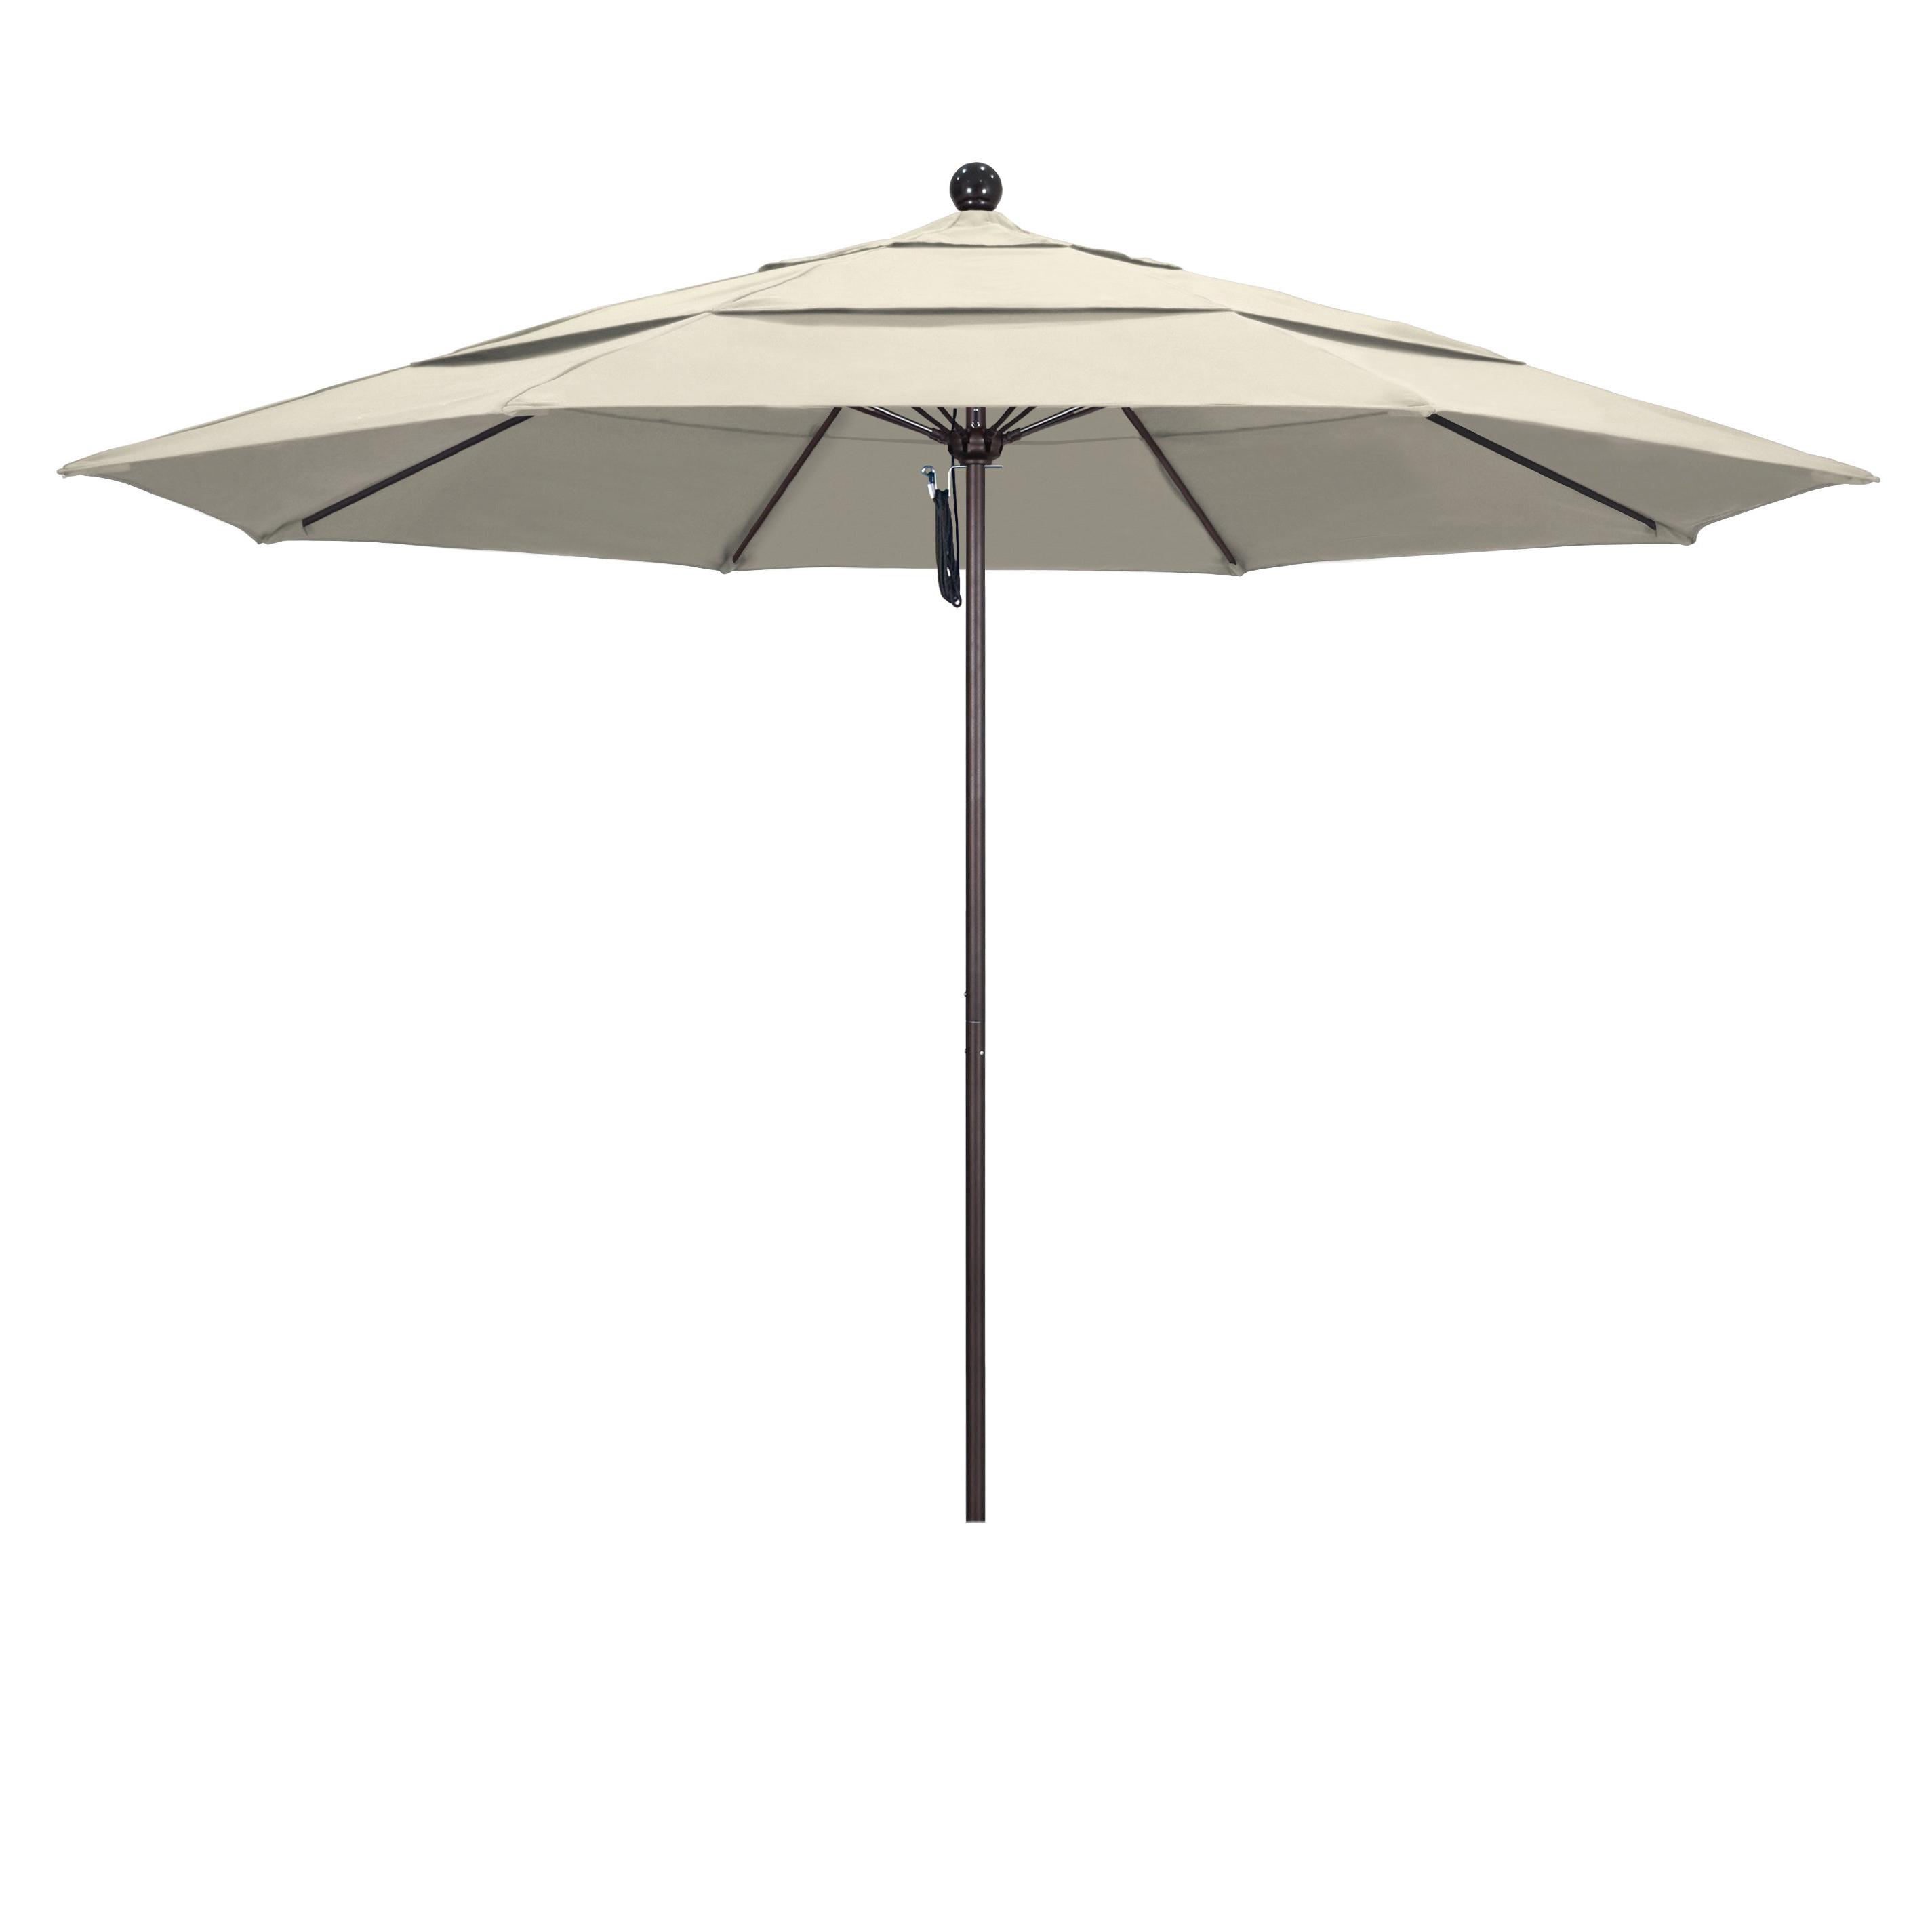 Launceston Market Umbrellas In Popular Duxbury 11' Market Umbrella (Gallery 7 of 20)